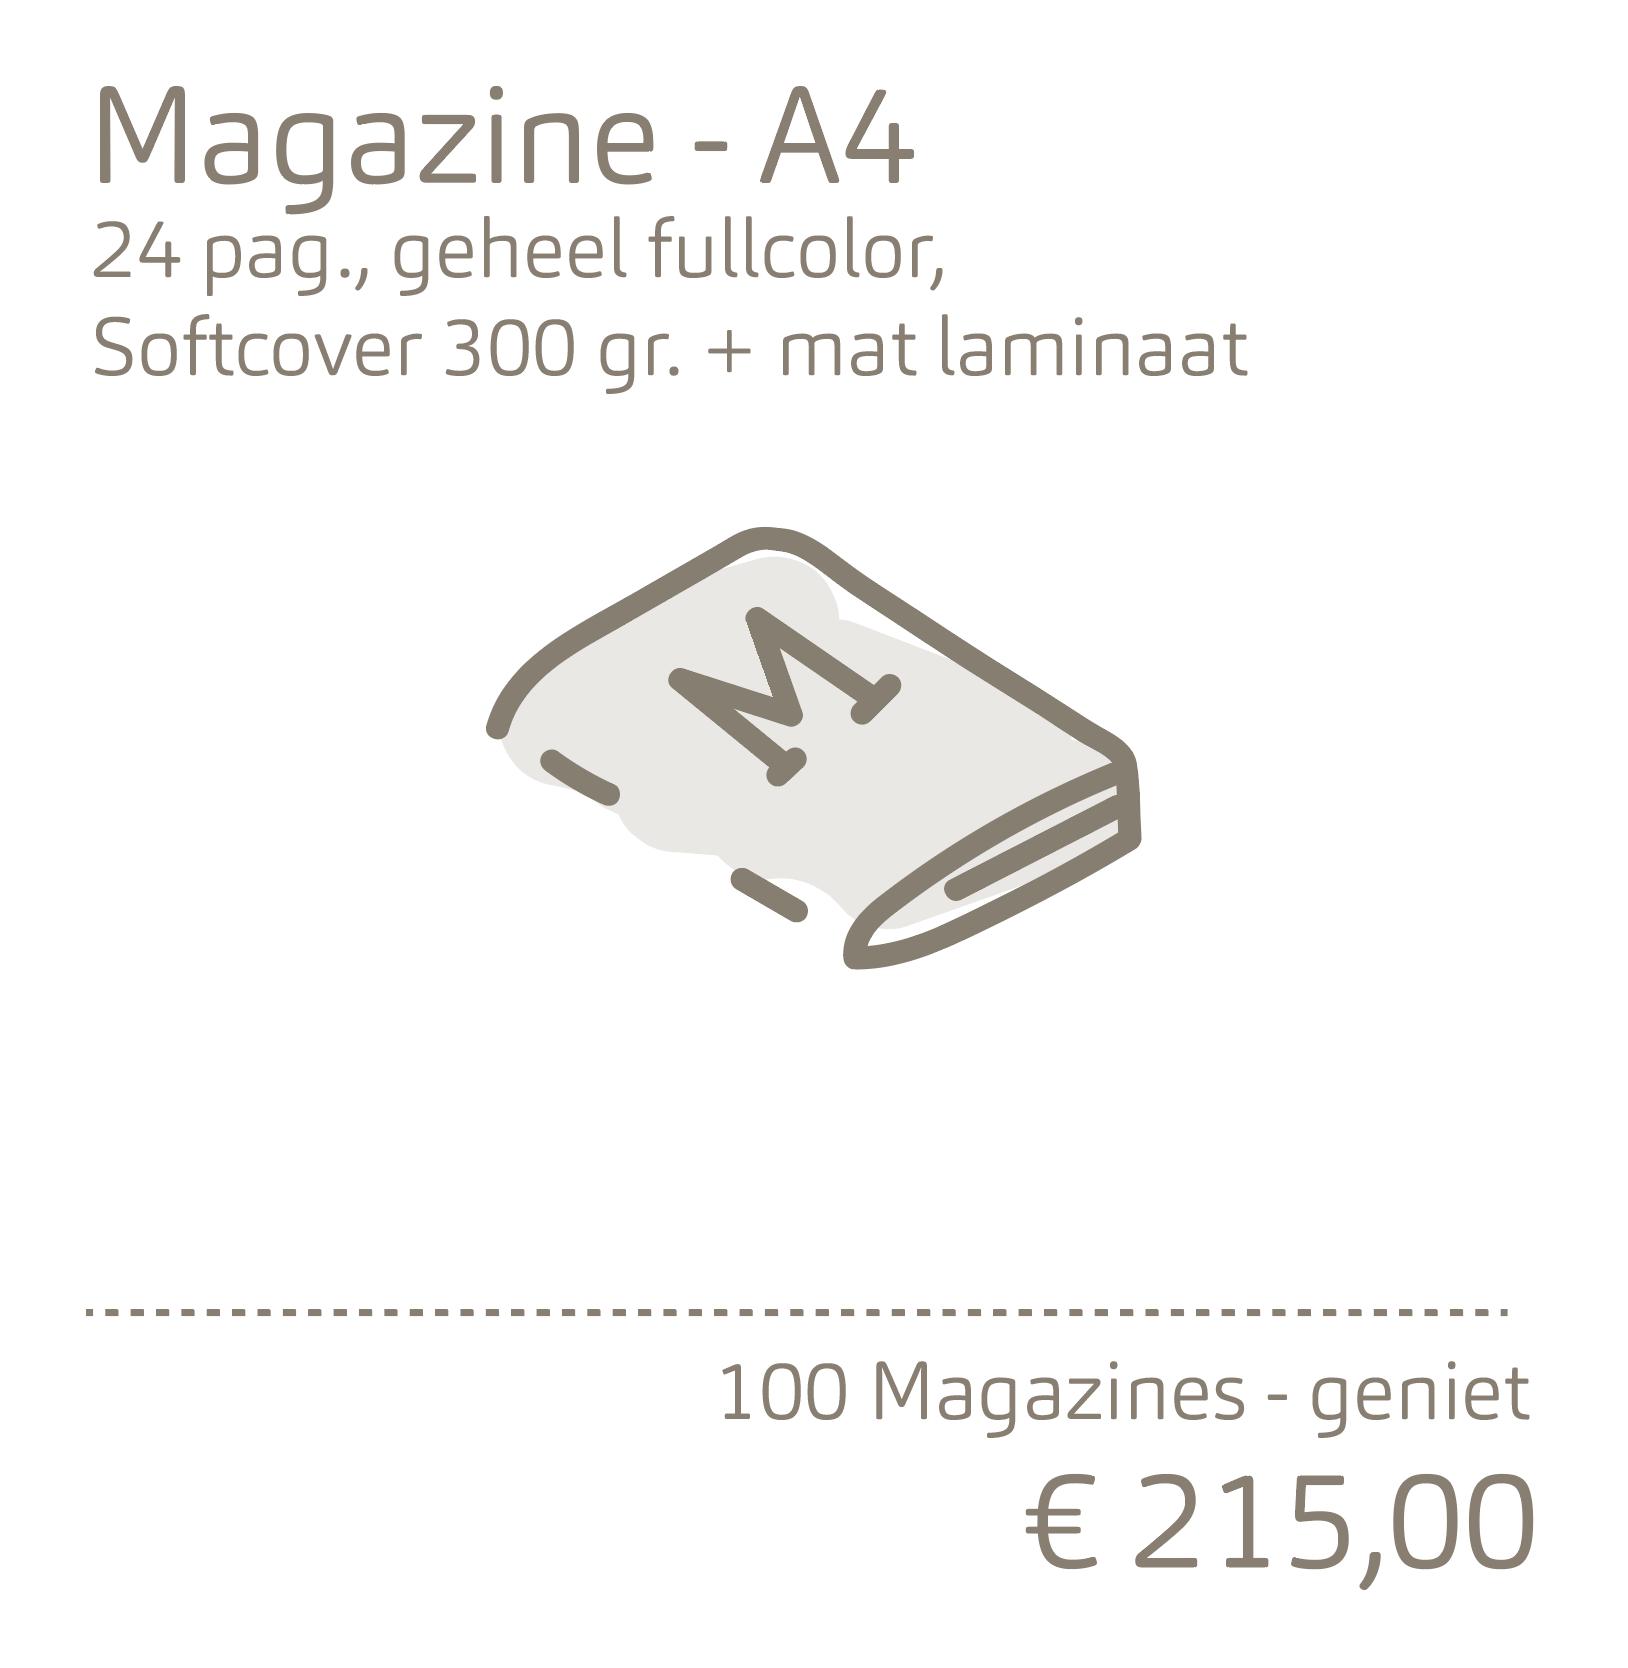 Magazine-A4 met 300 grams omslag